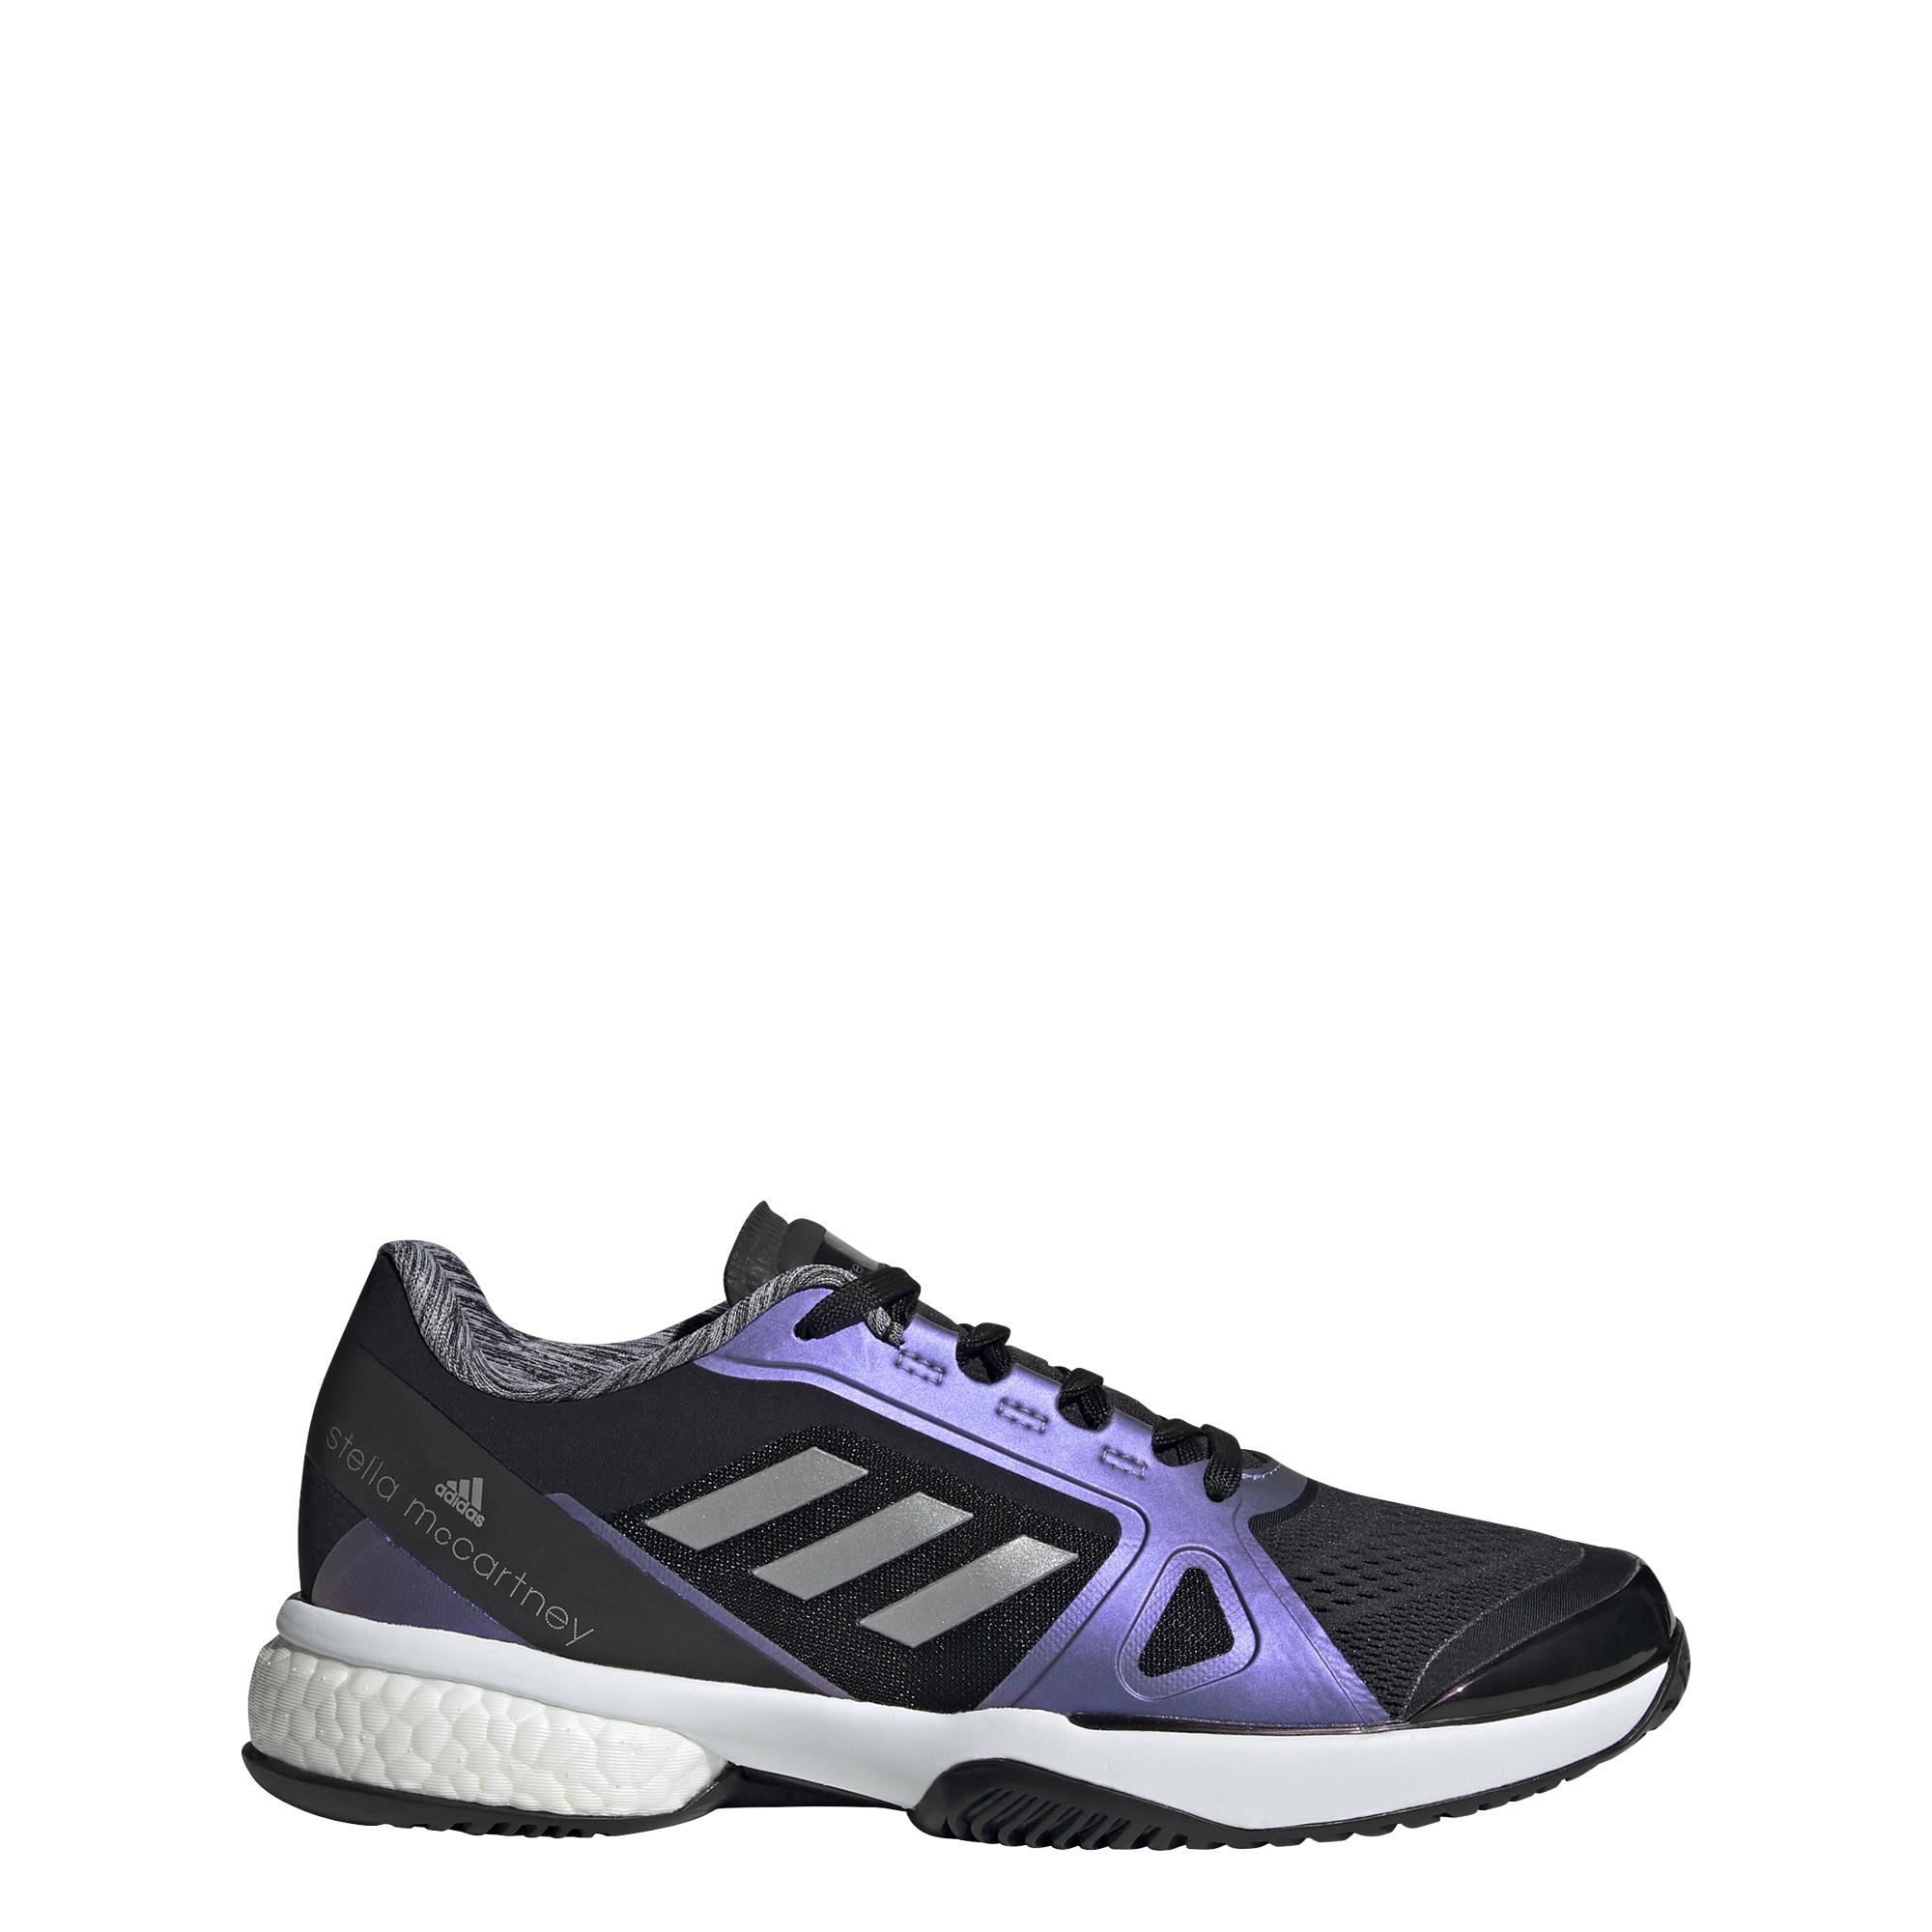 Stella Court 21 Women's Tennis Shoe - Black/Purple